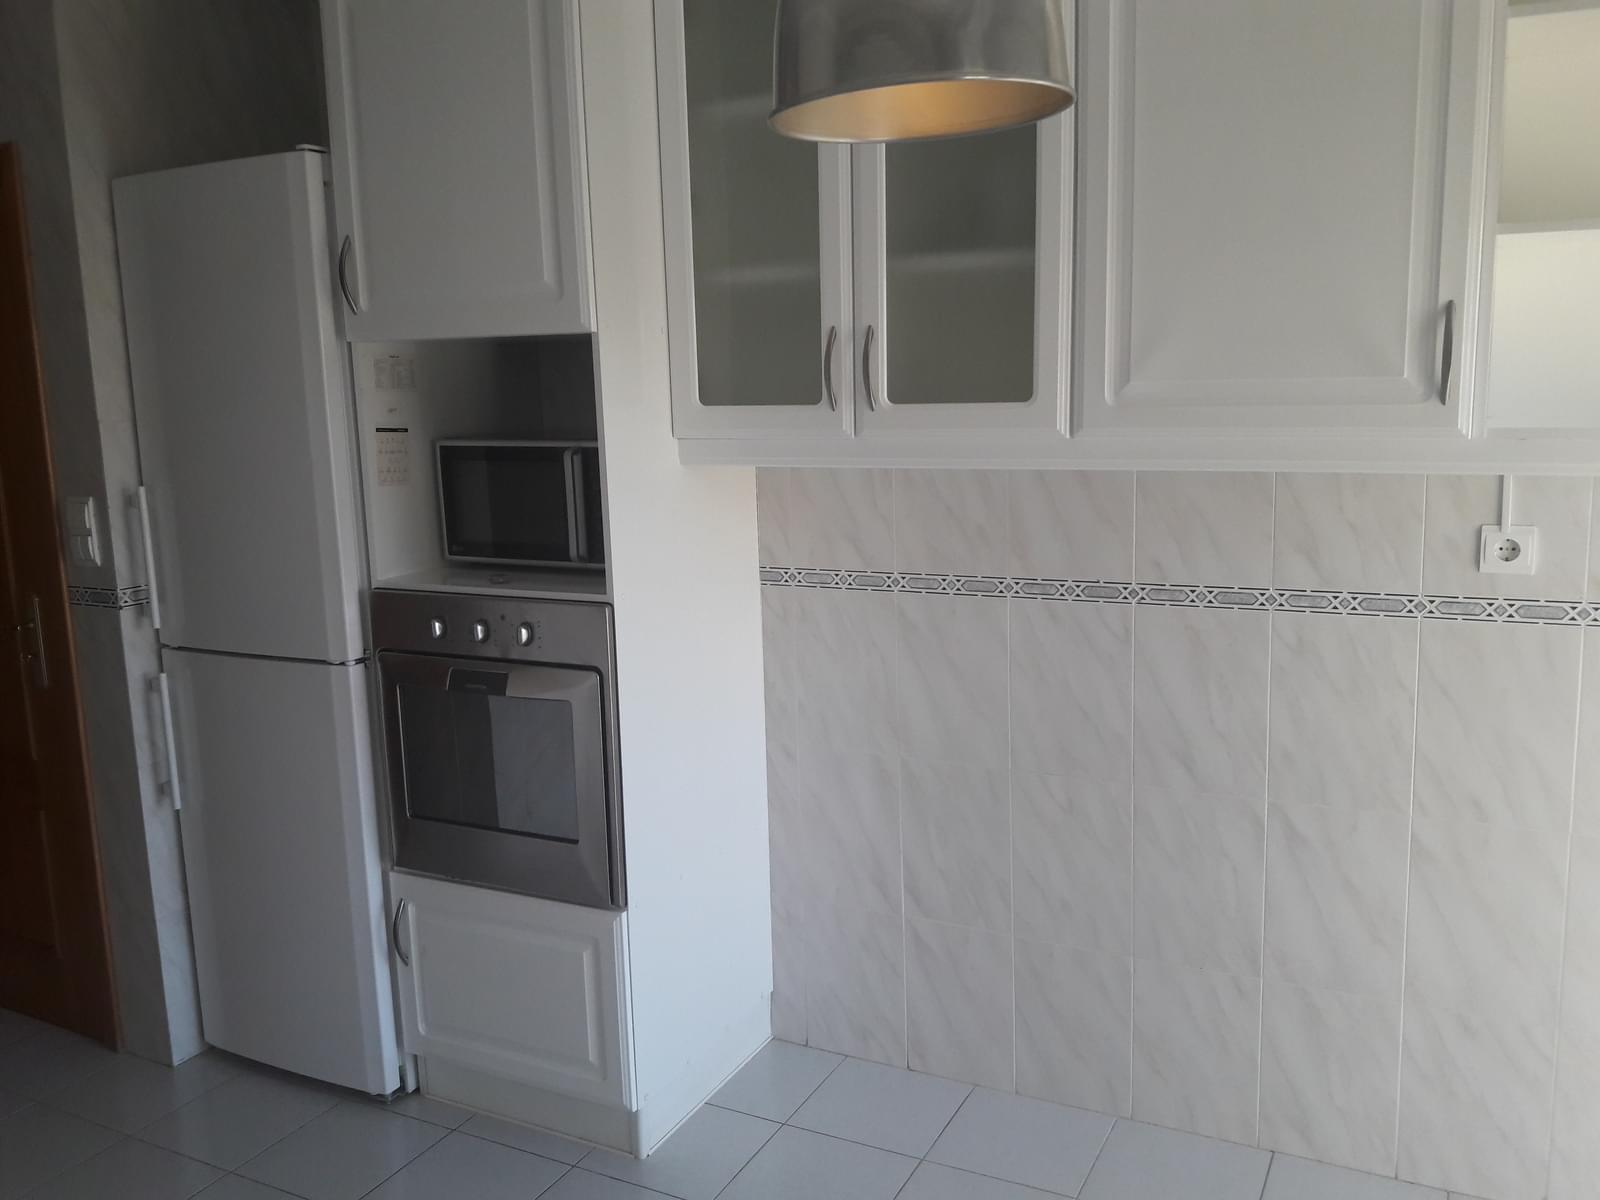 pf18038-apartamento-t3-b81a8228-7448-4abd-8426-7ad09ae281eb